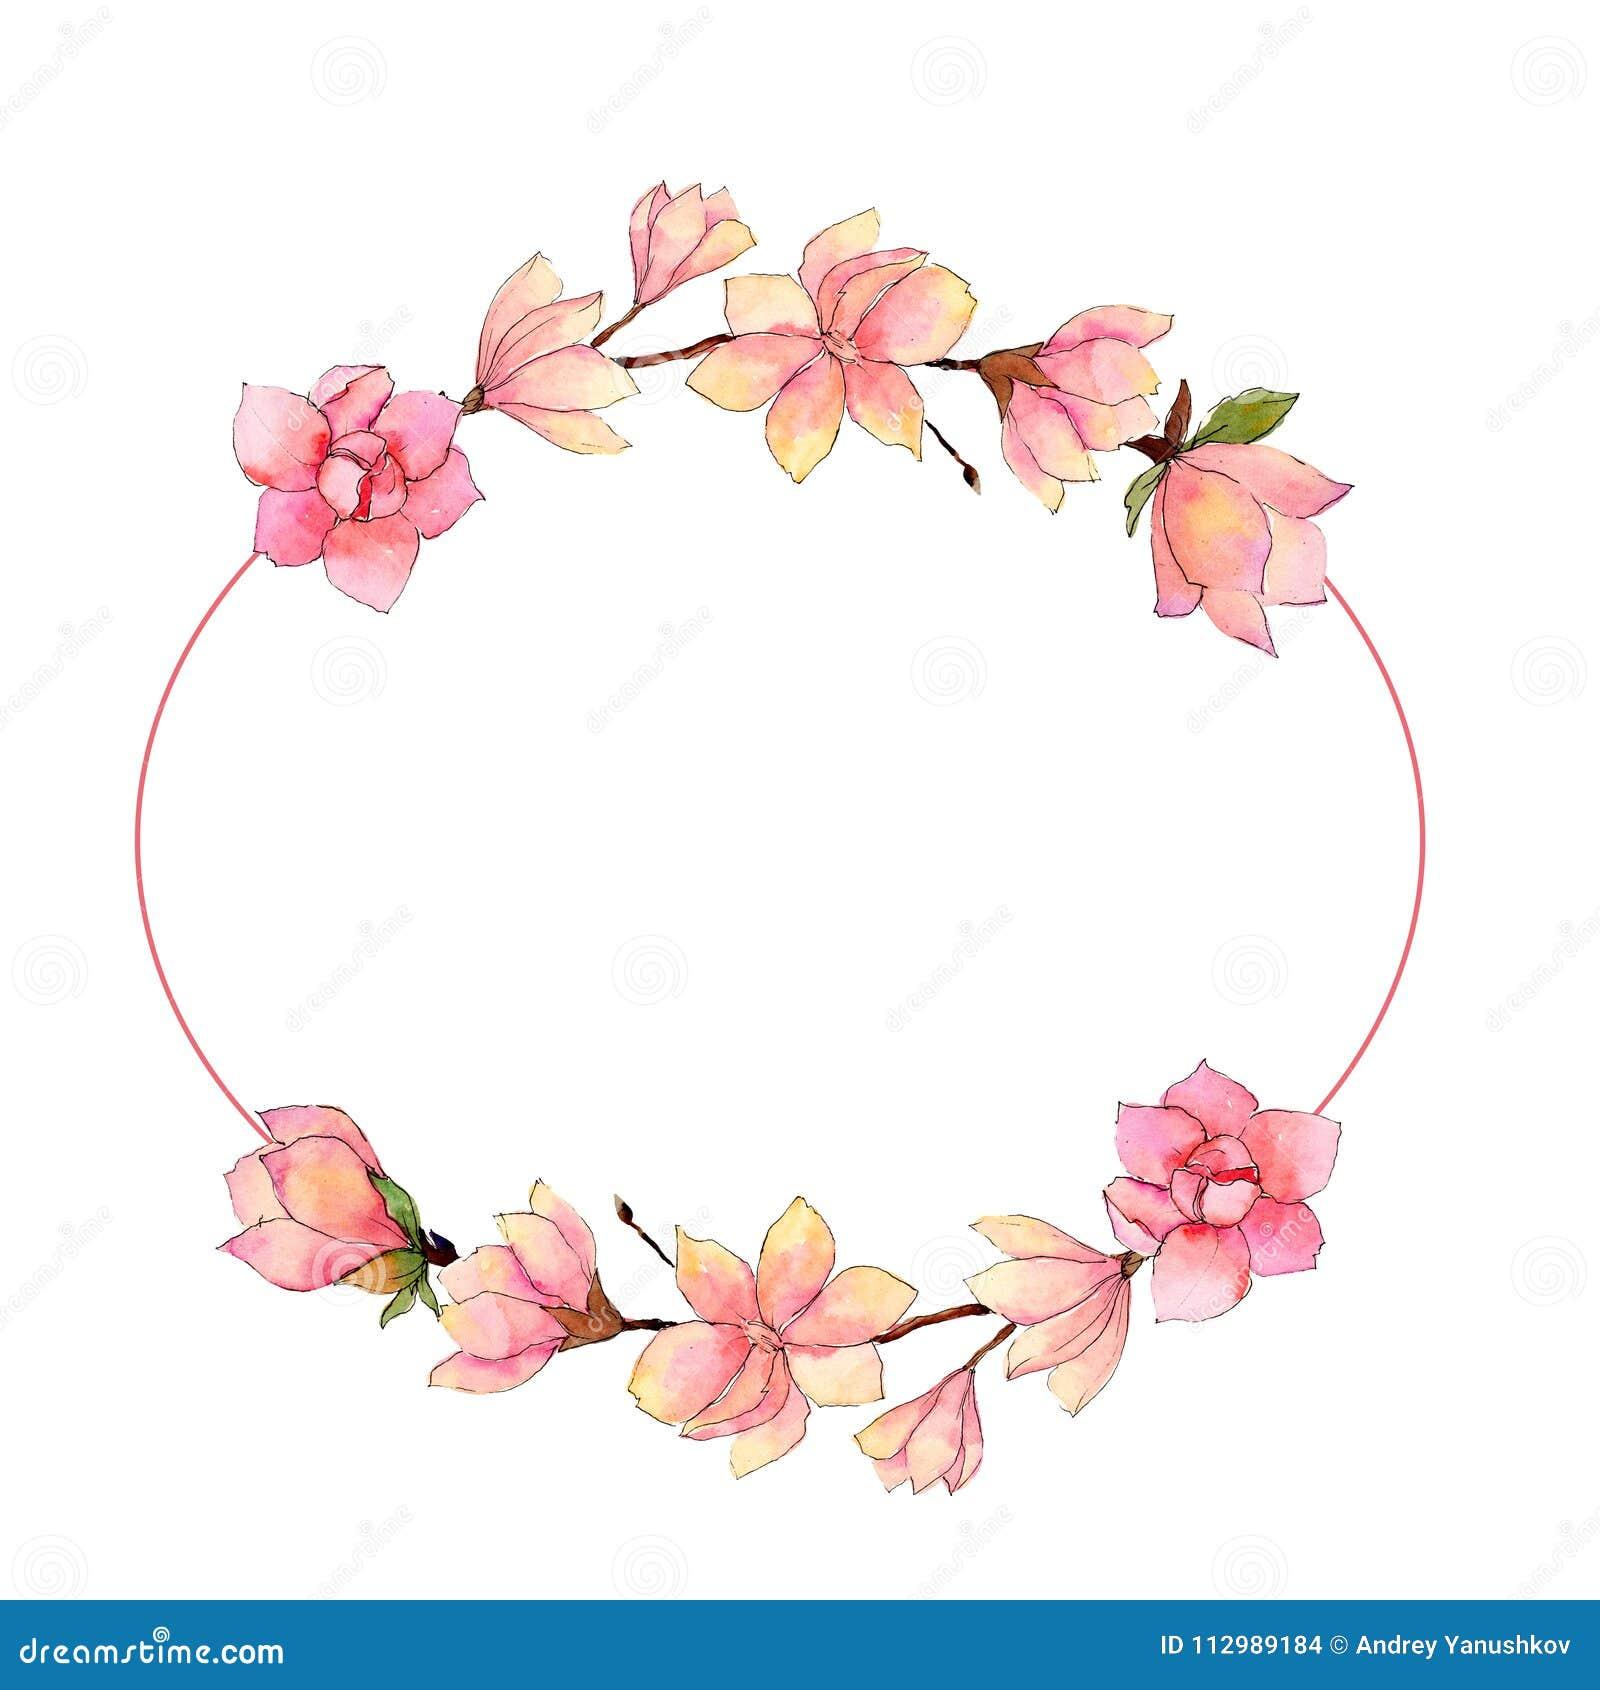 Wildflower magnolia flower wreath in a watercolor style.